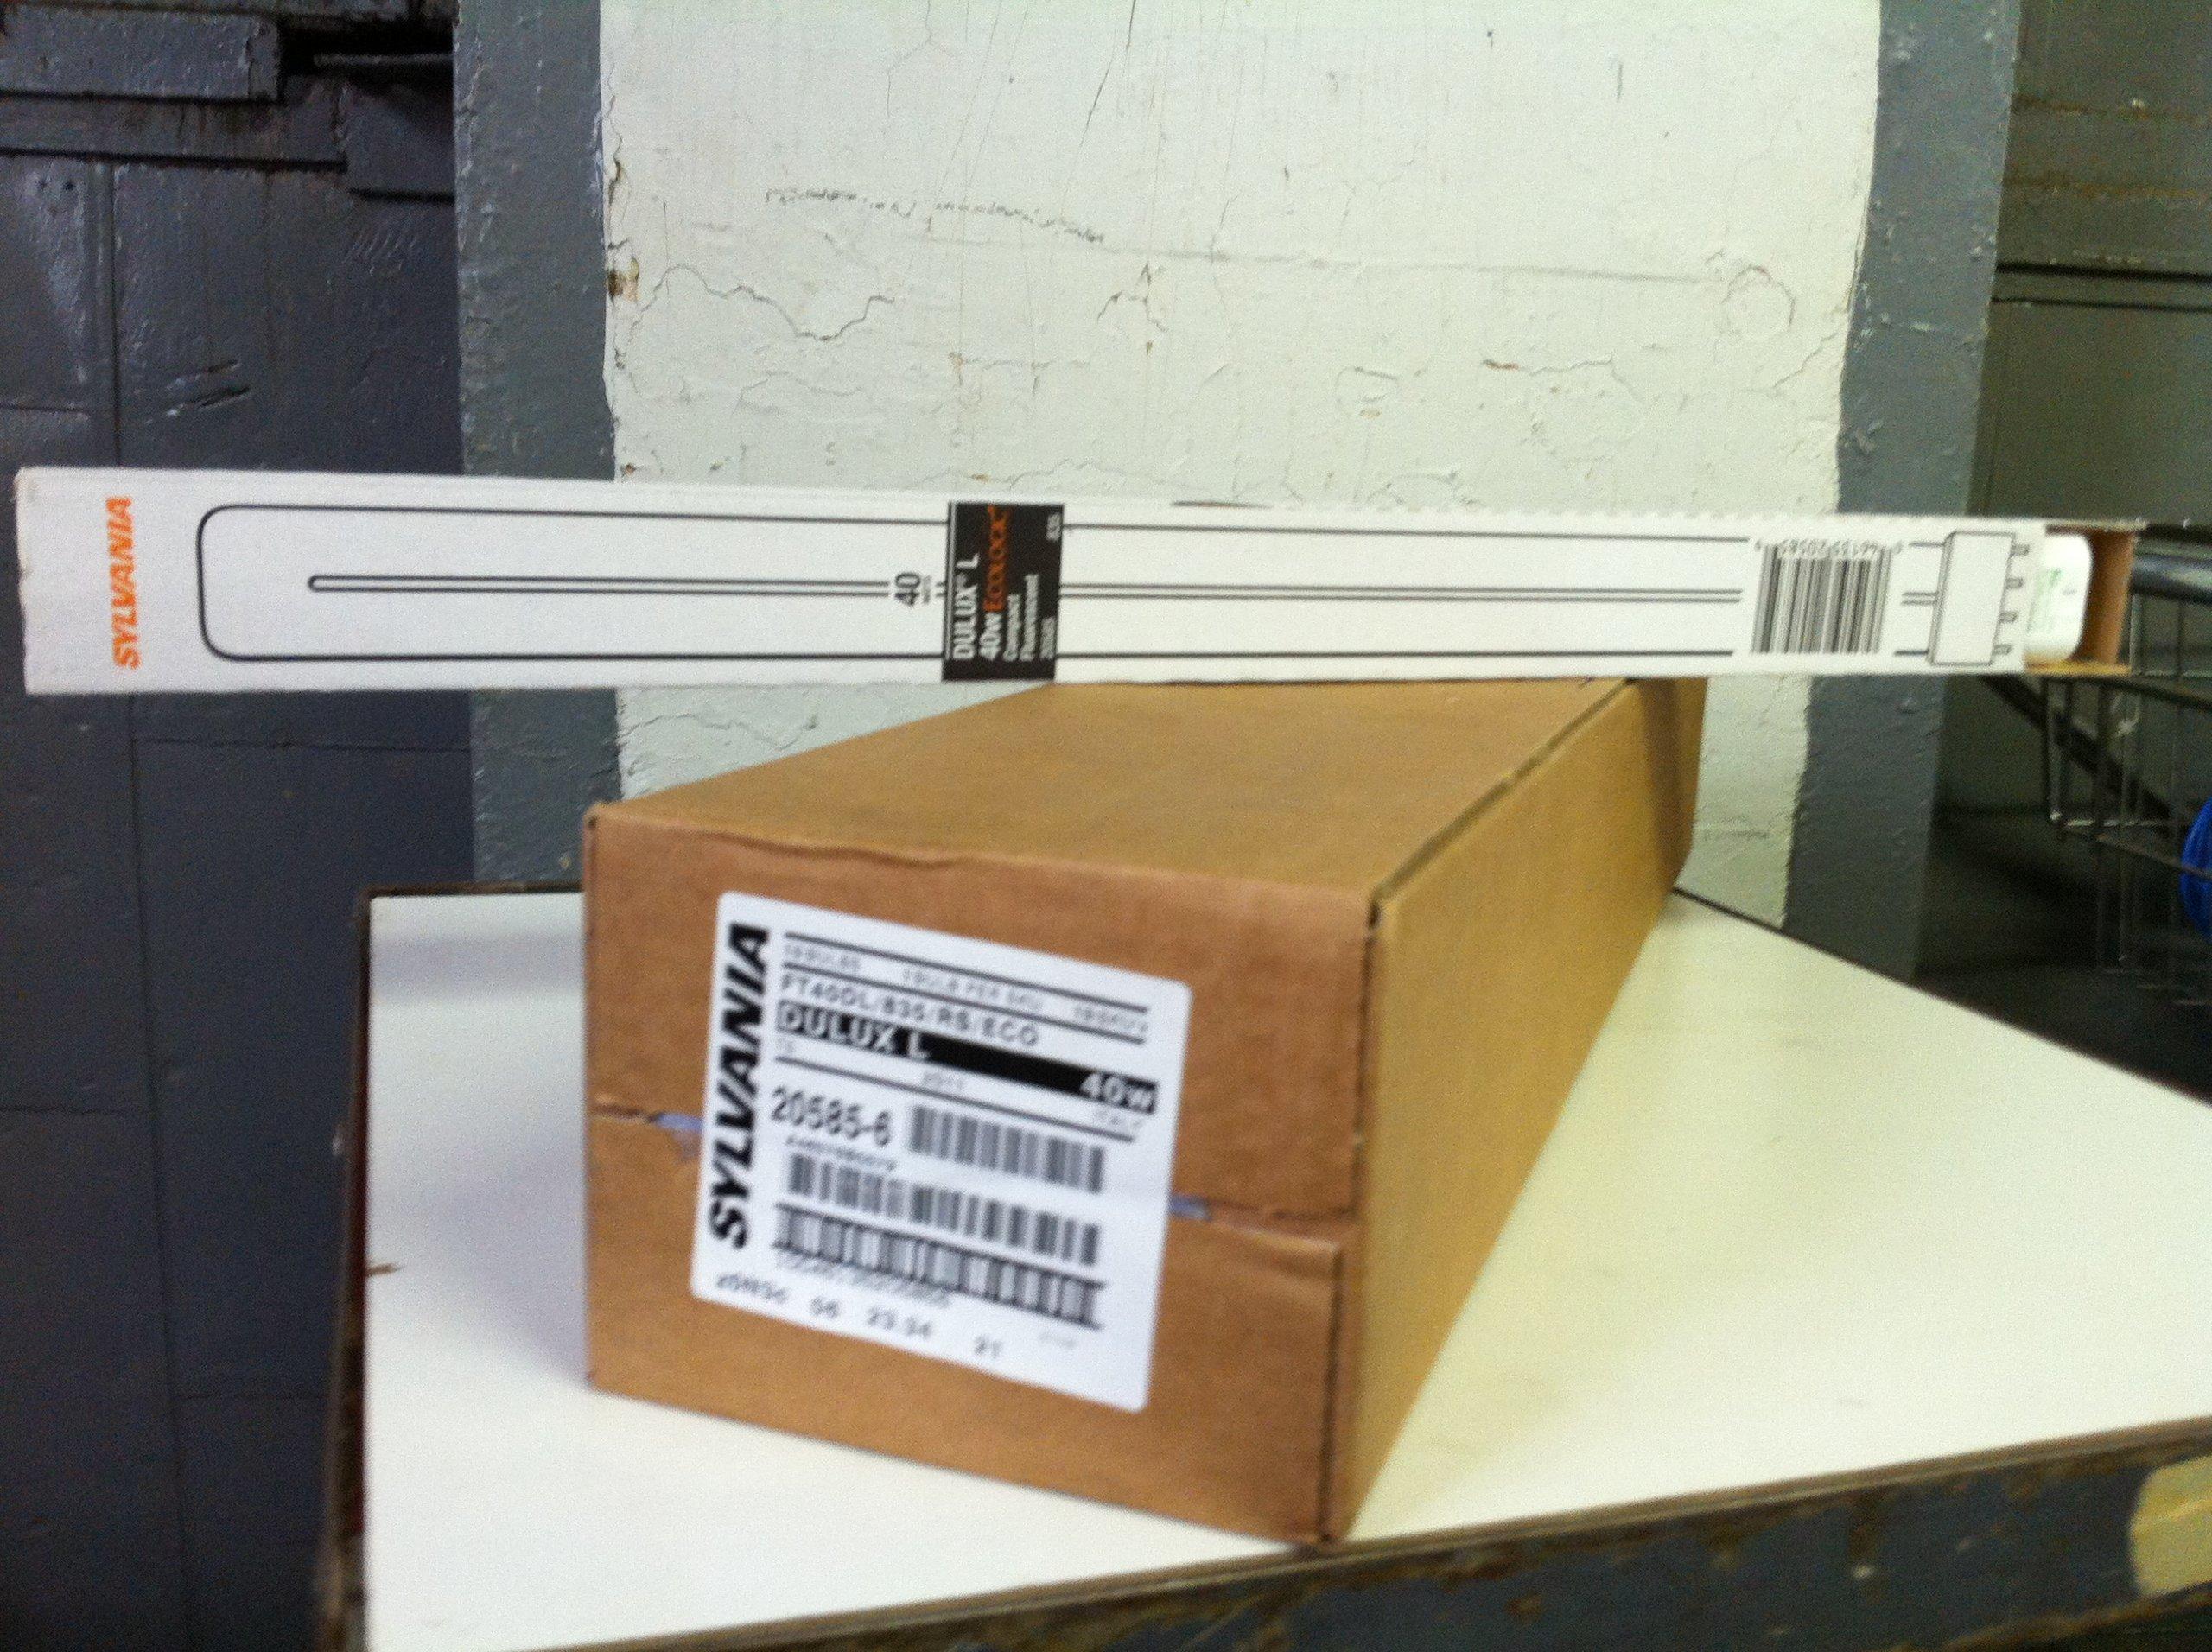 Sylvania 20585 FT40DL/835/RS/Eco Dulux L 40W Ecologic Compact Flourescent Cfl Light Lamp, 40 Watt, 4 Pin, 2G11 Base, 3500K, Pack of 10, White